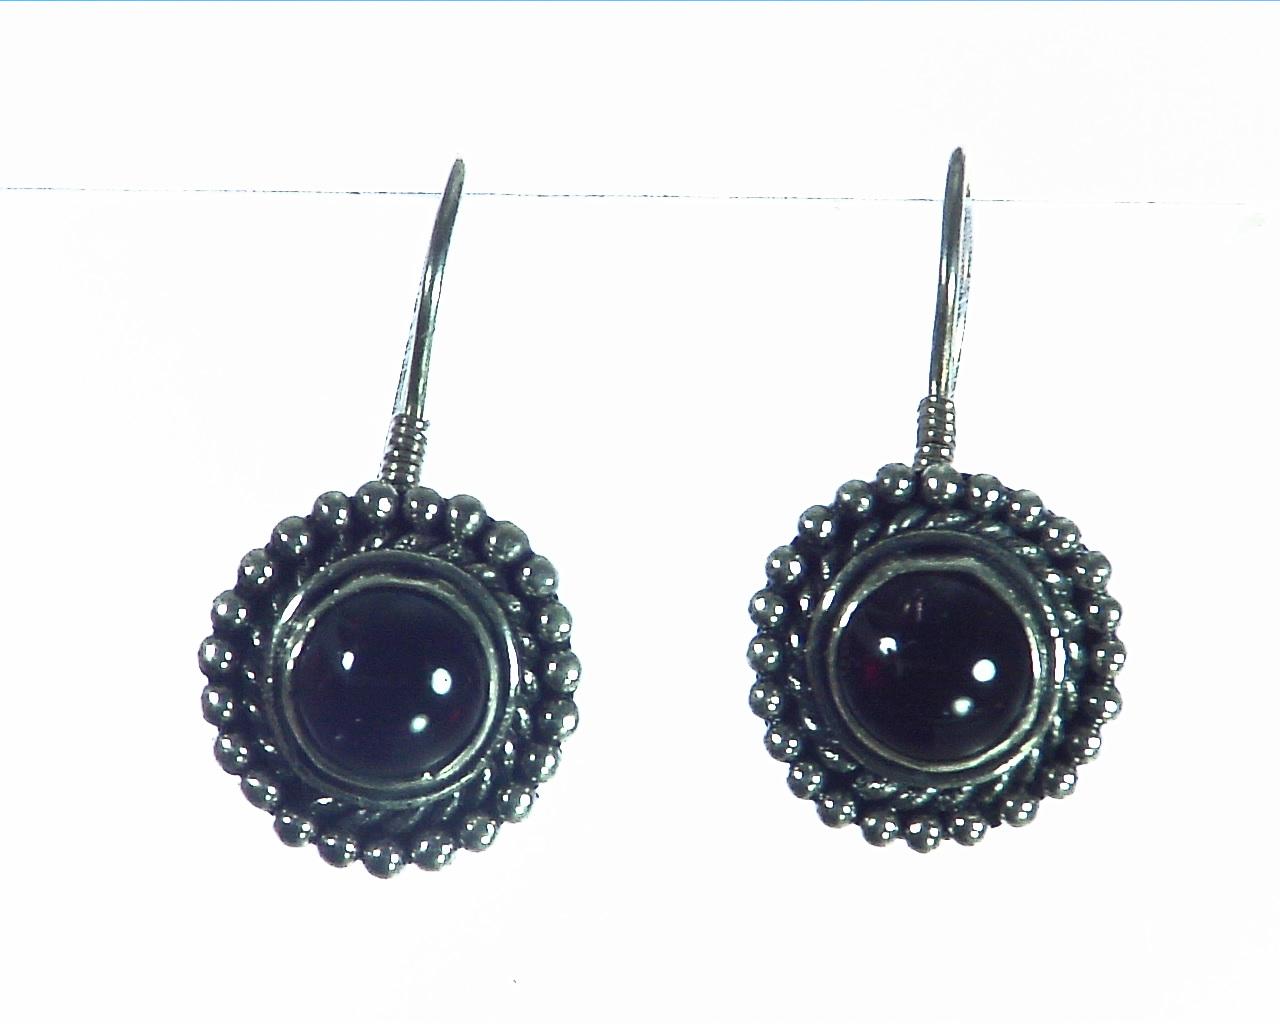 Garnet Cabasson Set in Sterling Silver Earring, 795 4